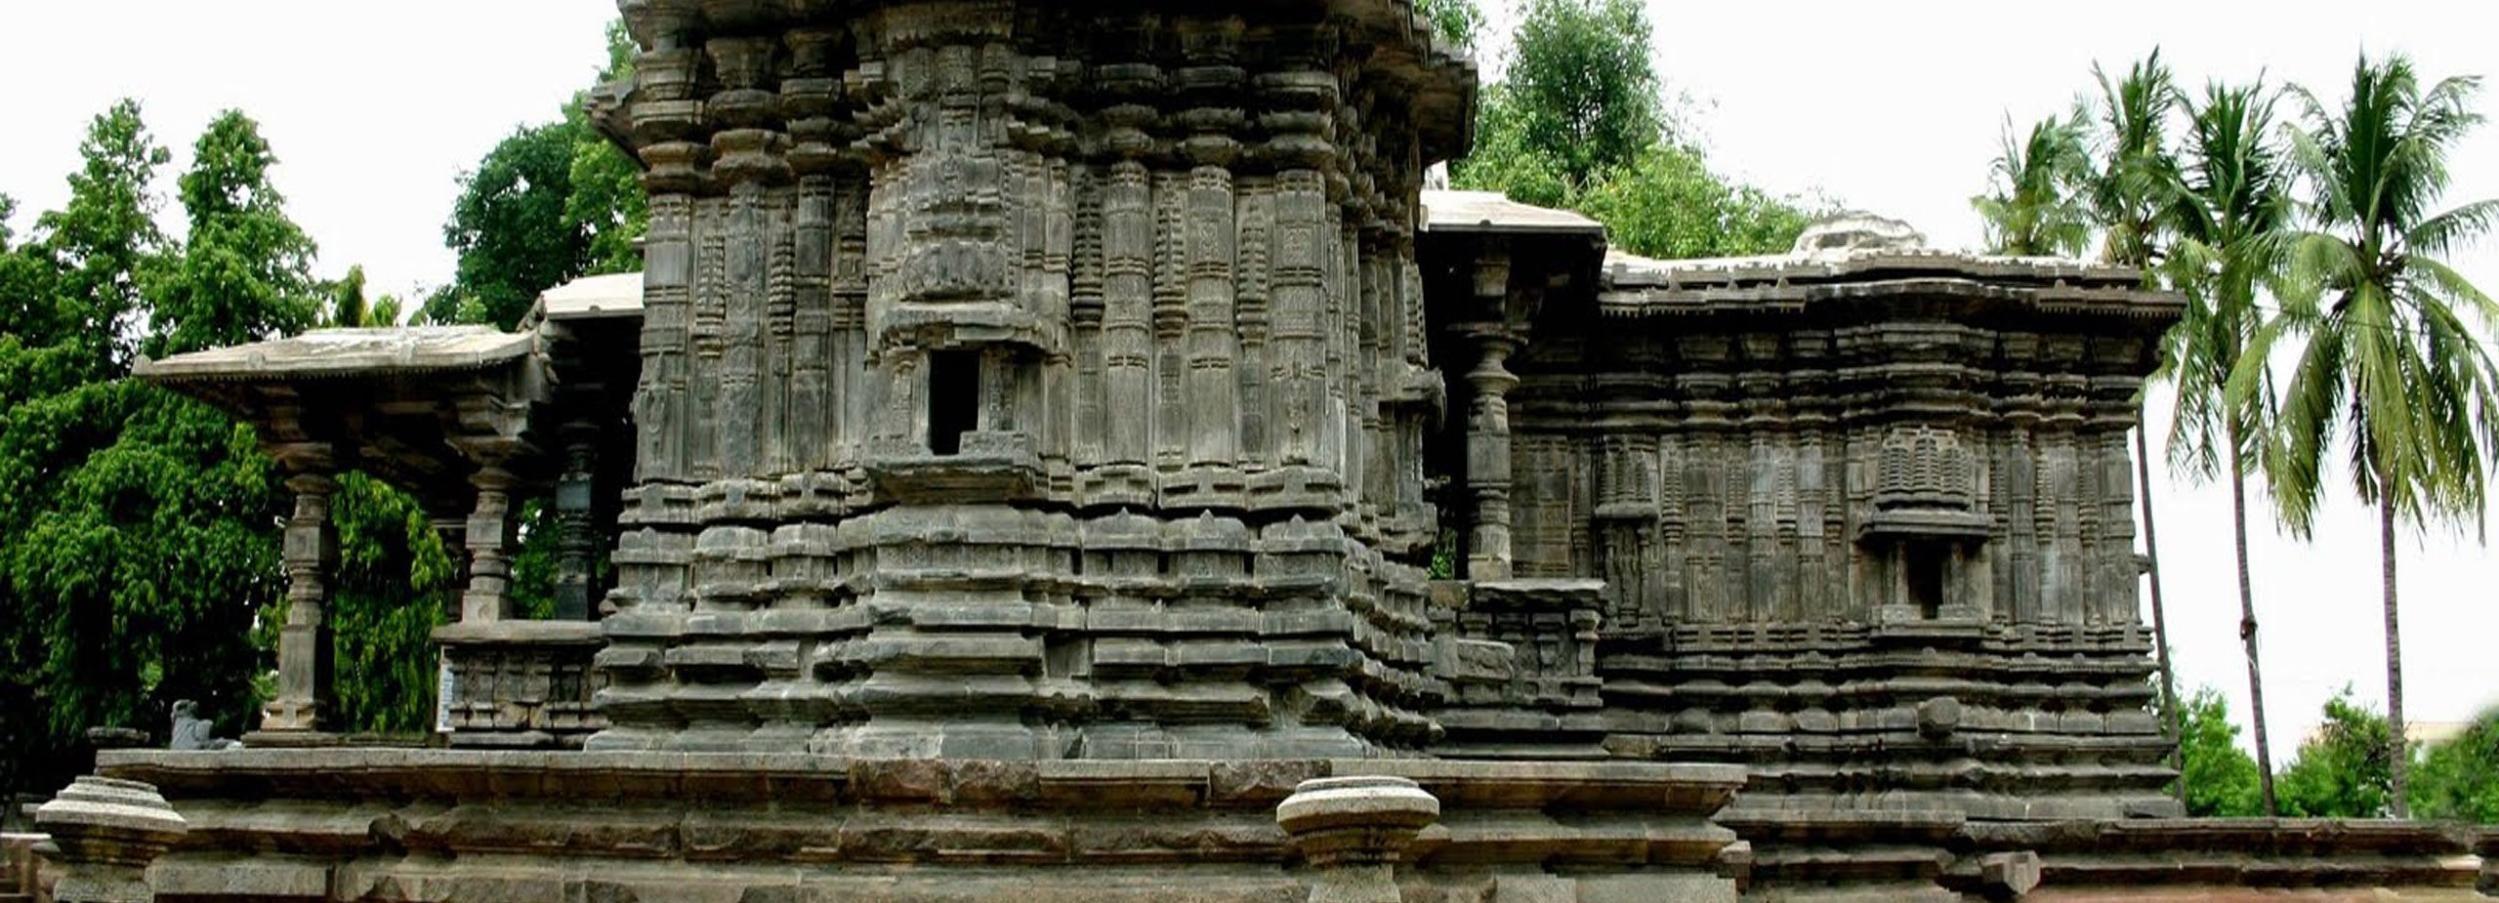 Mangalore: 6-Hour Private Tour